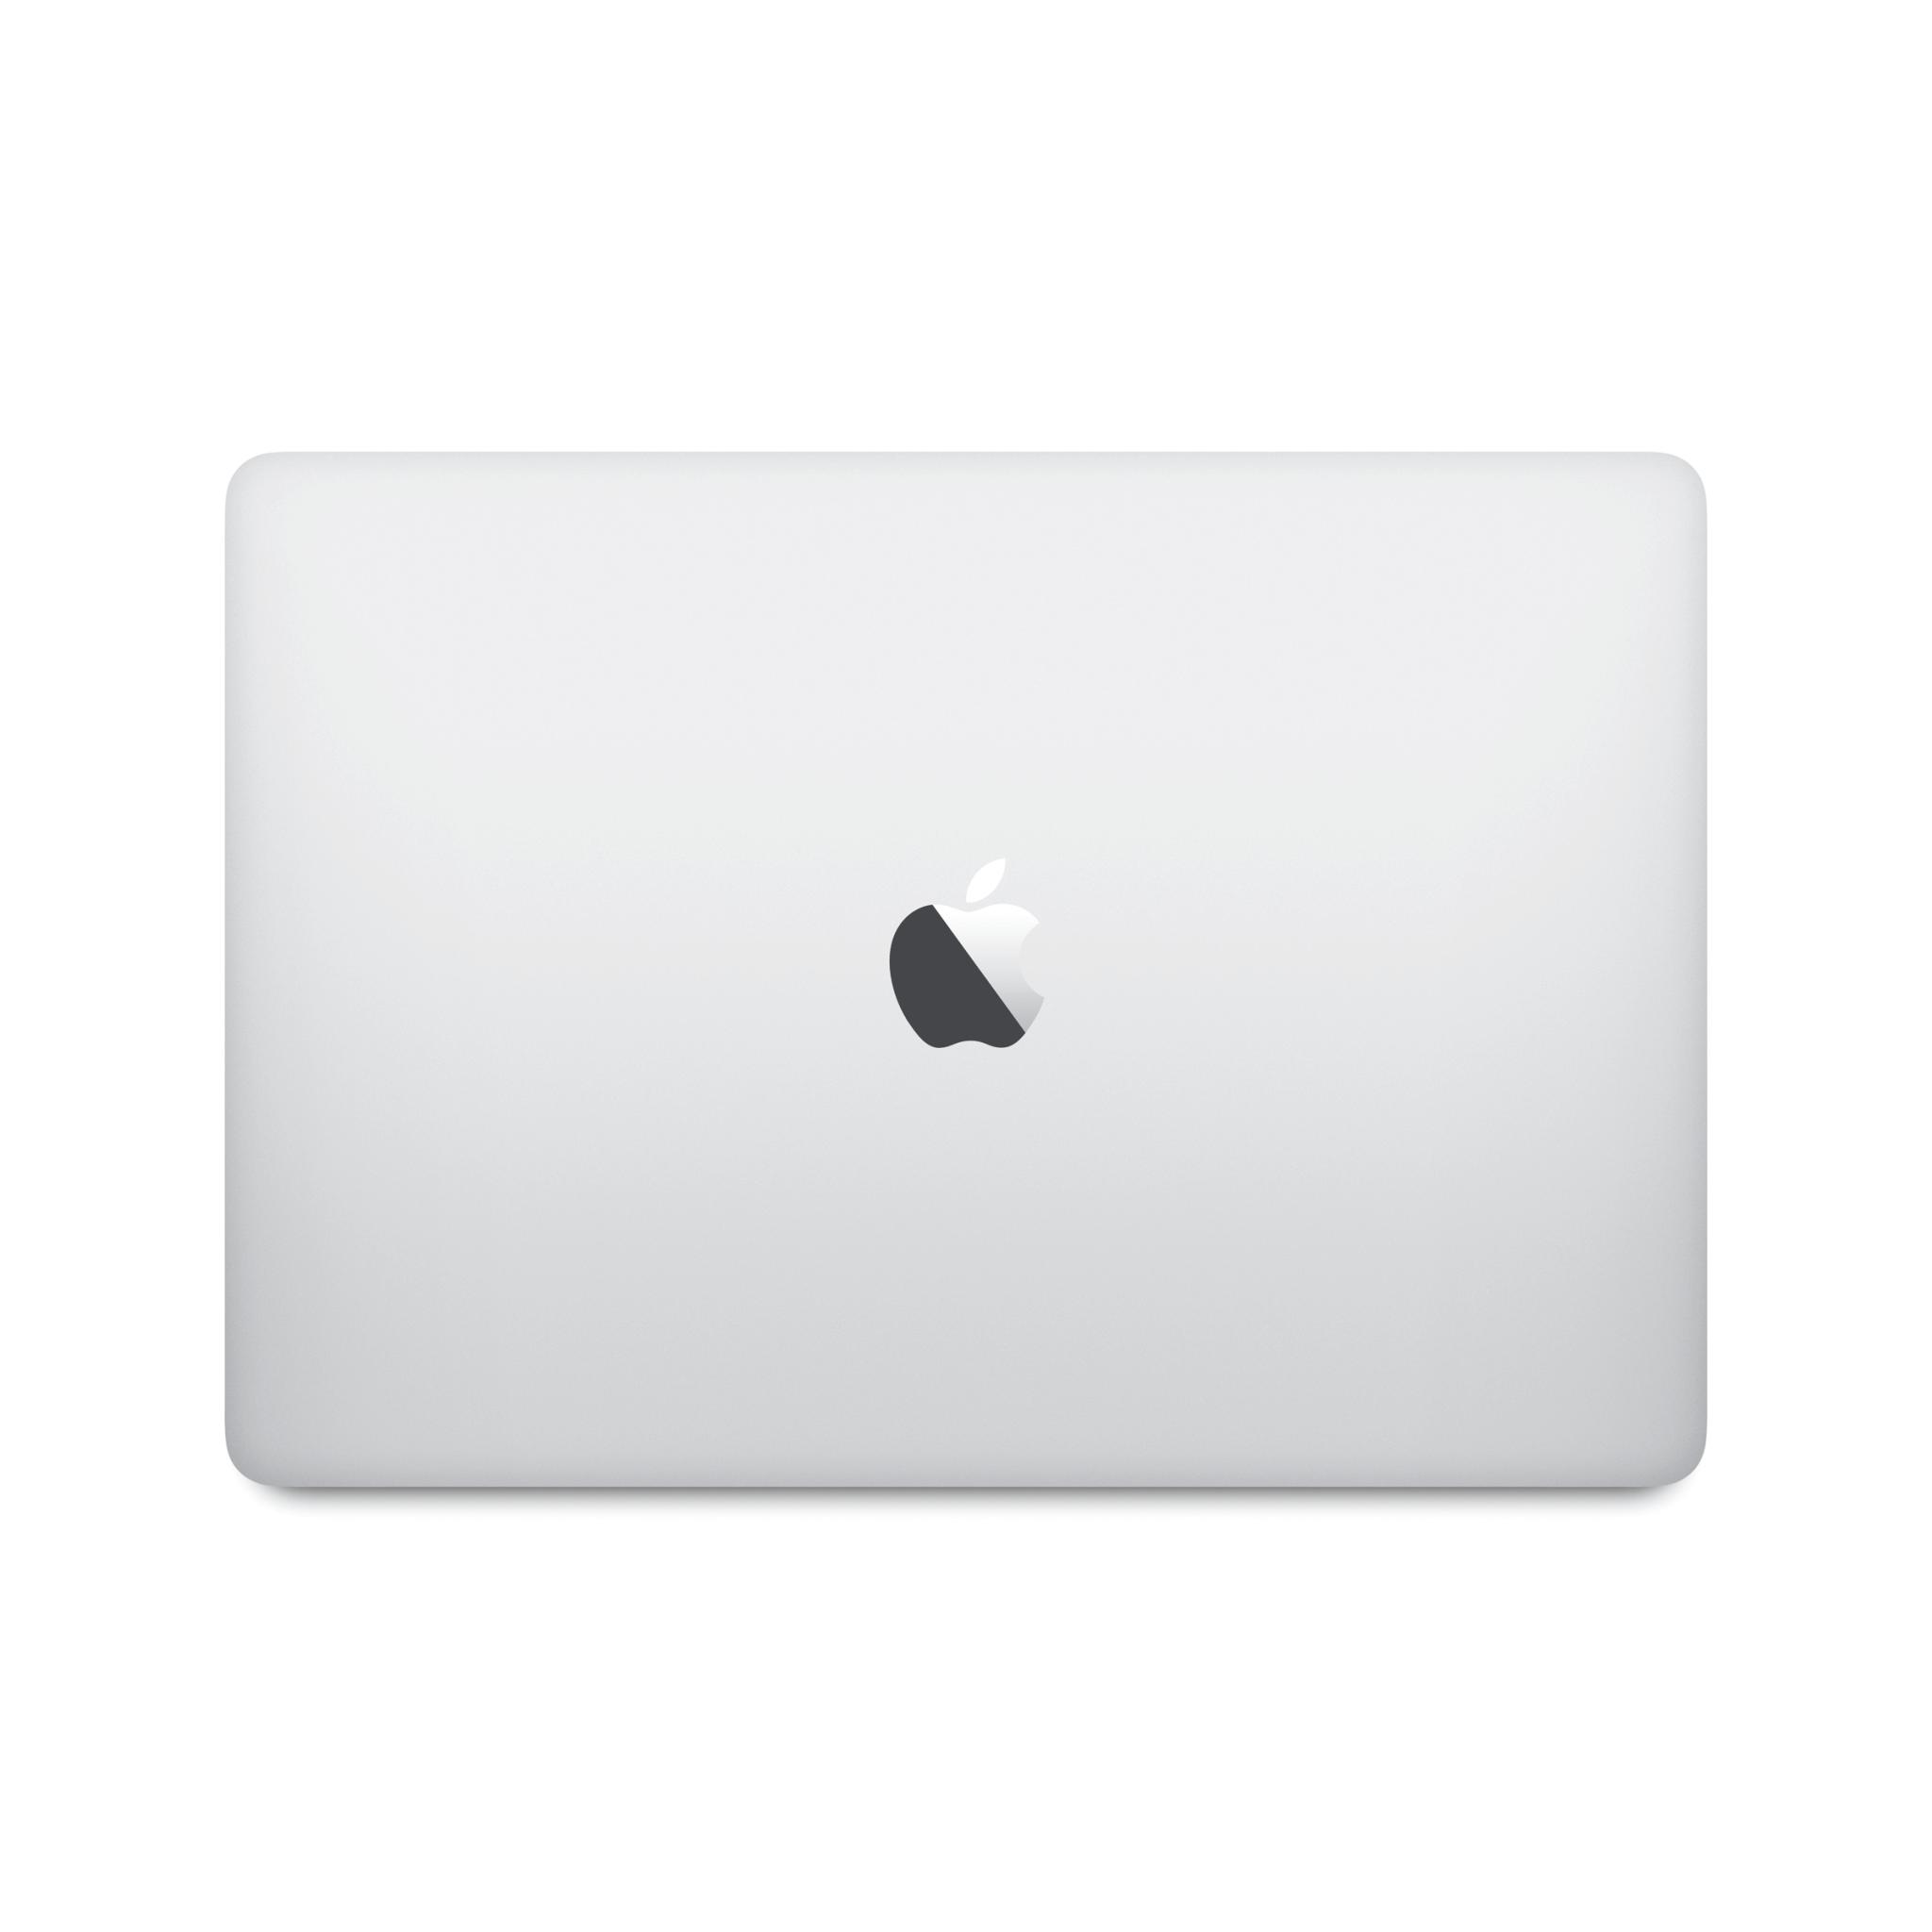 MacBook Pro 2016 mit 13-Zoll-Display in Silber (Bildrechte: Apple)